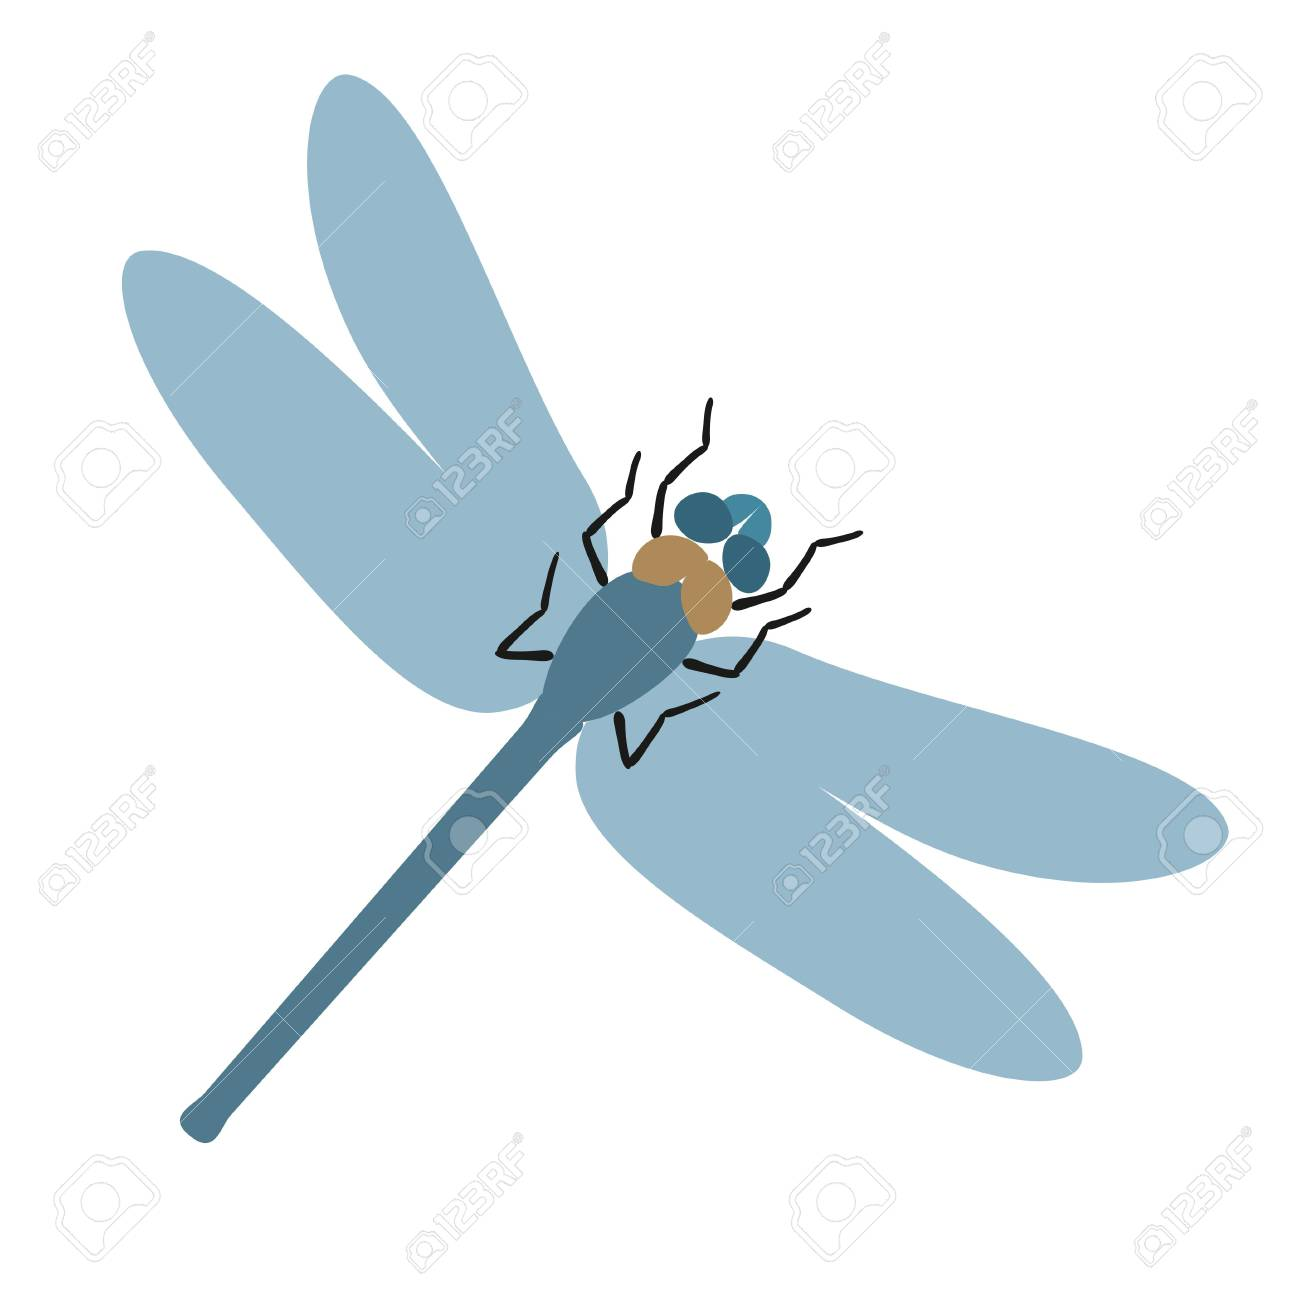 flat dragonfly vector illustration royalty free cliparts vectors rh 123rf com dragonfly vector free dragonfly vector art free